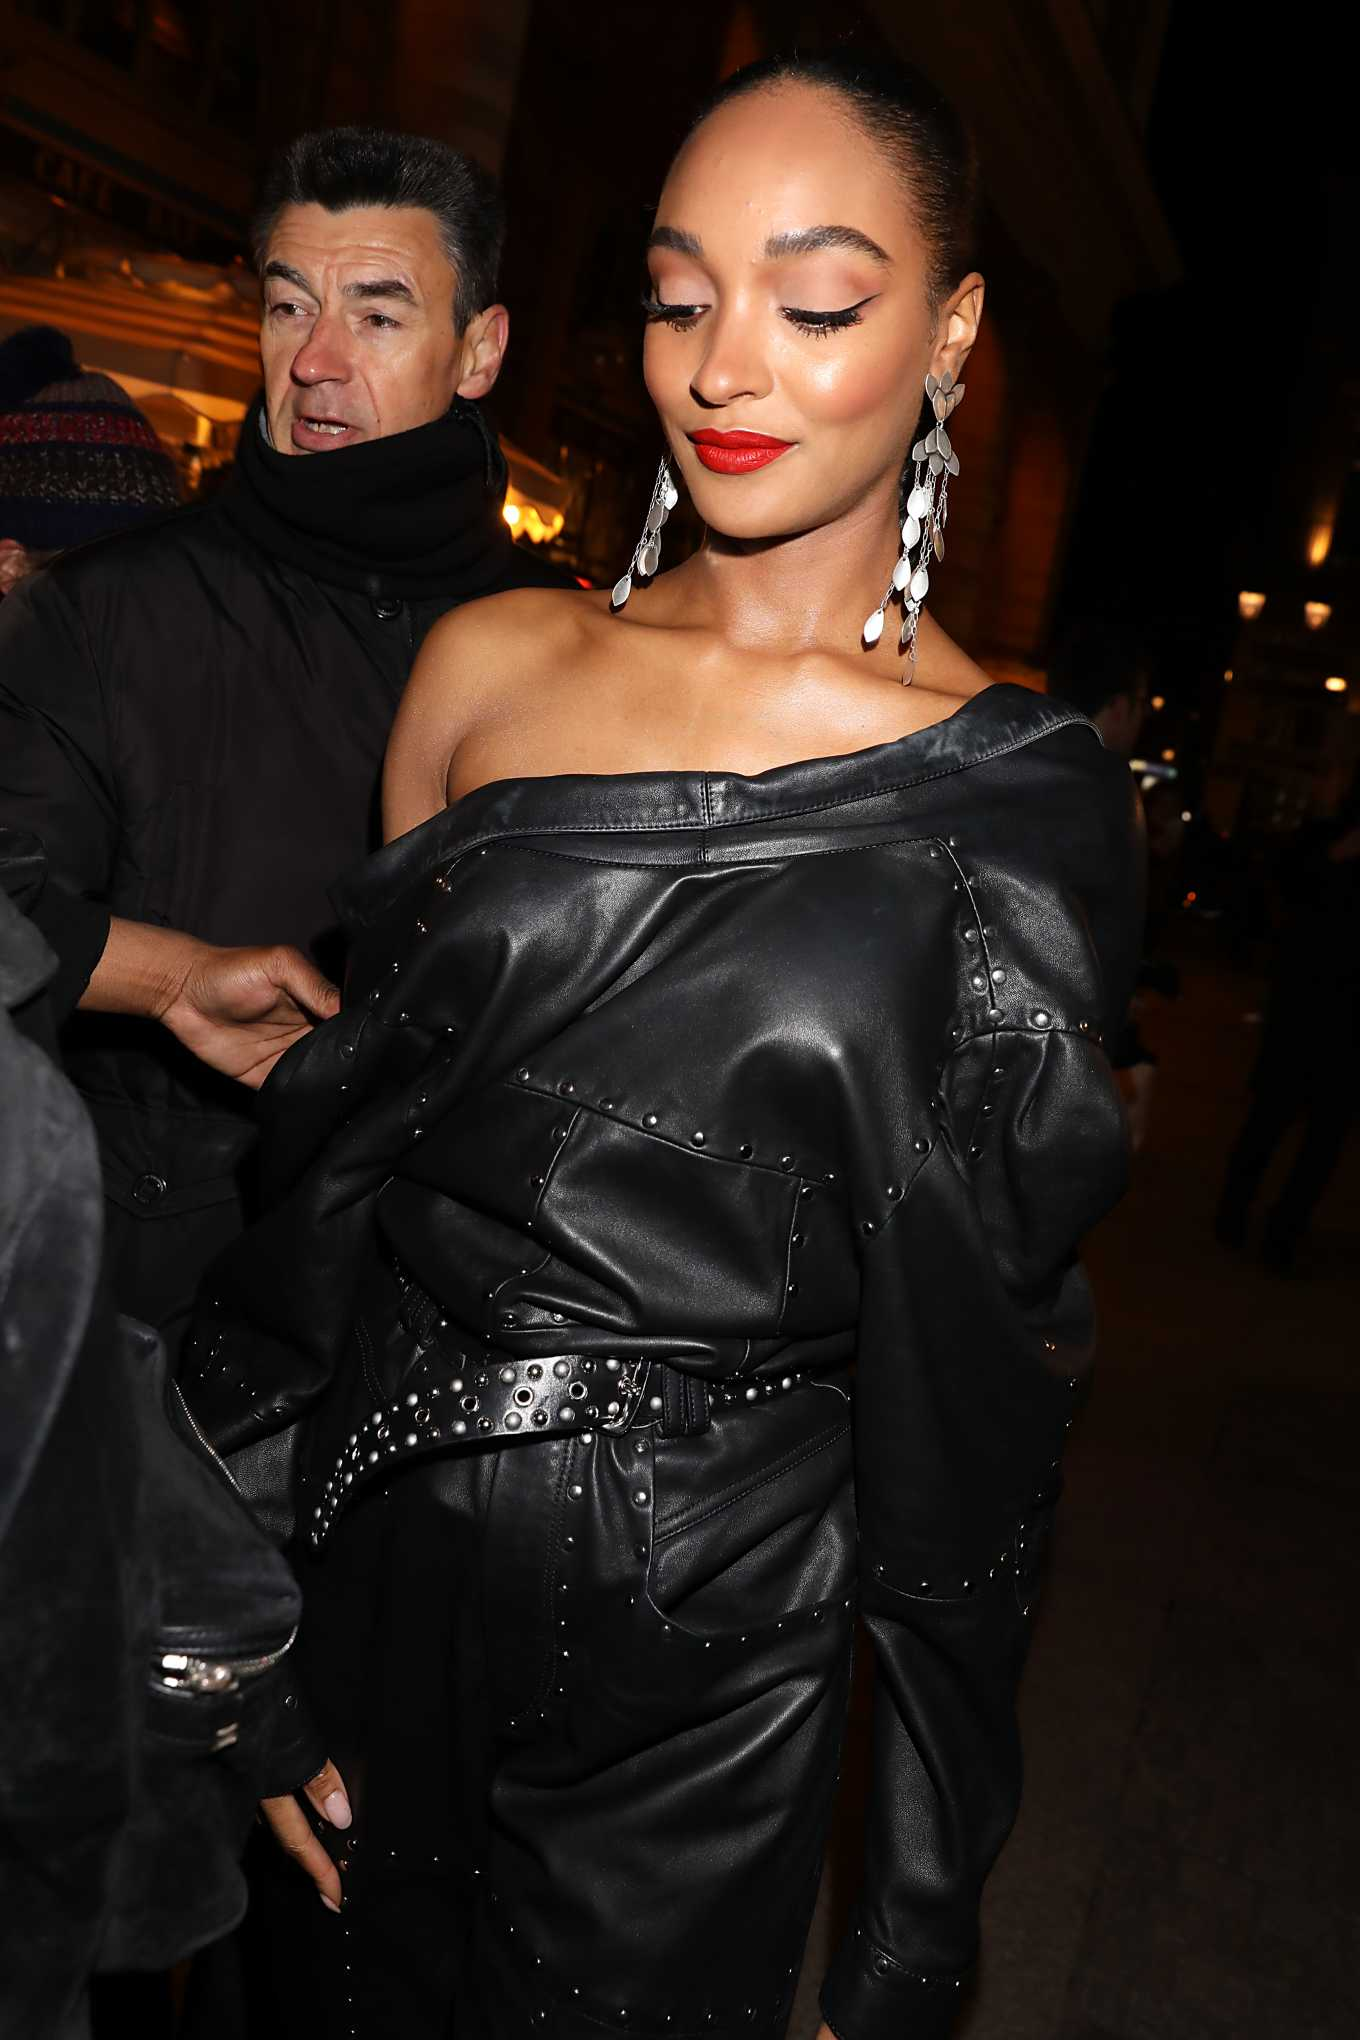 Jourdan Dunn - Arriving at Isabel Marant Show in Paris